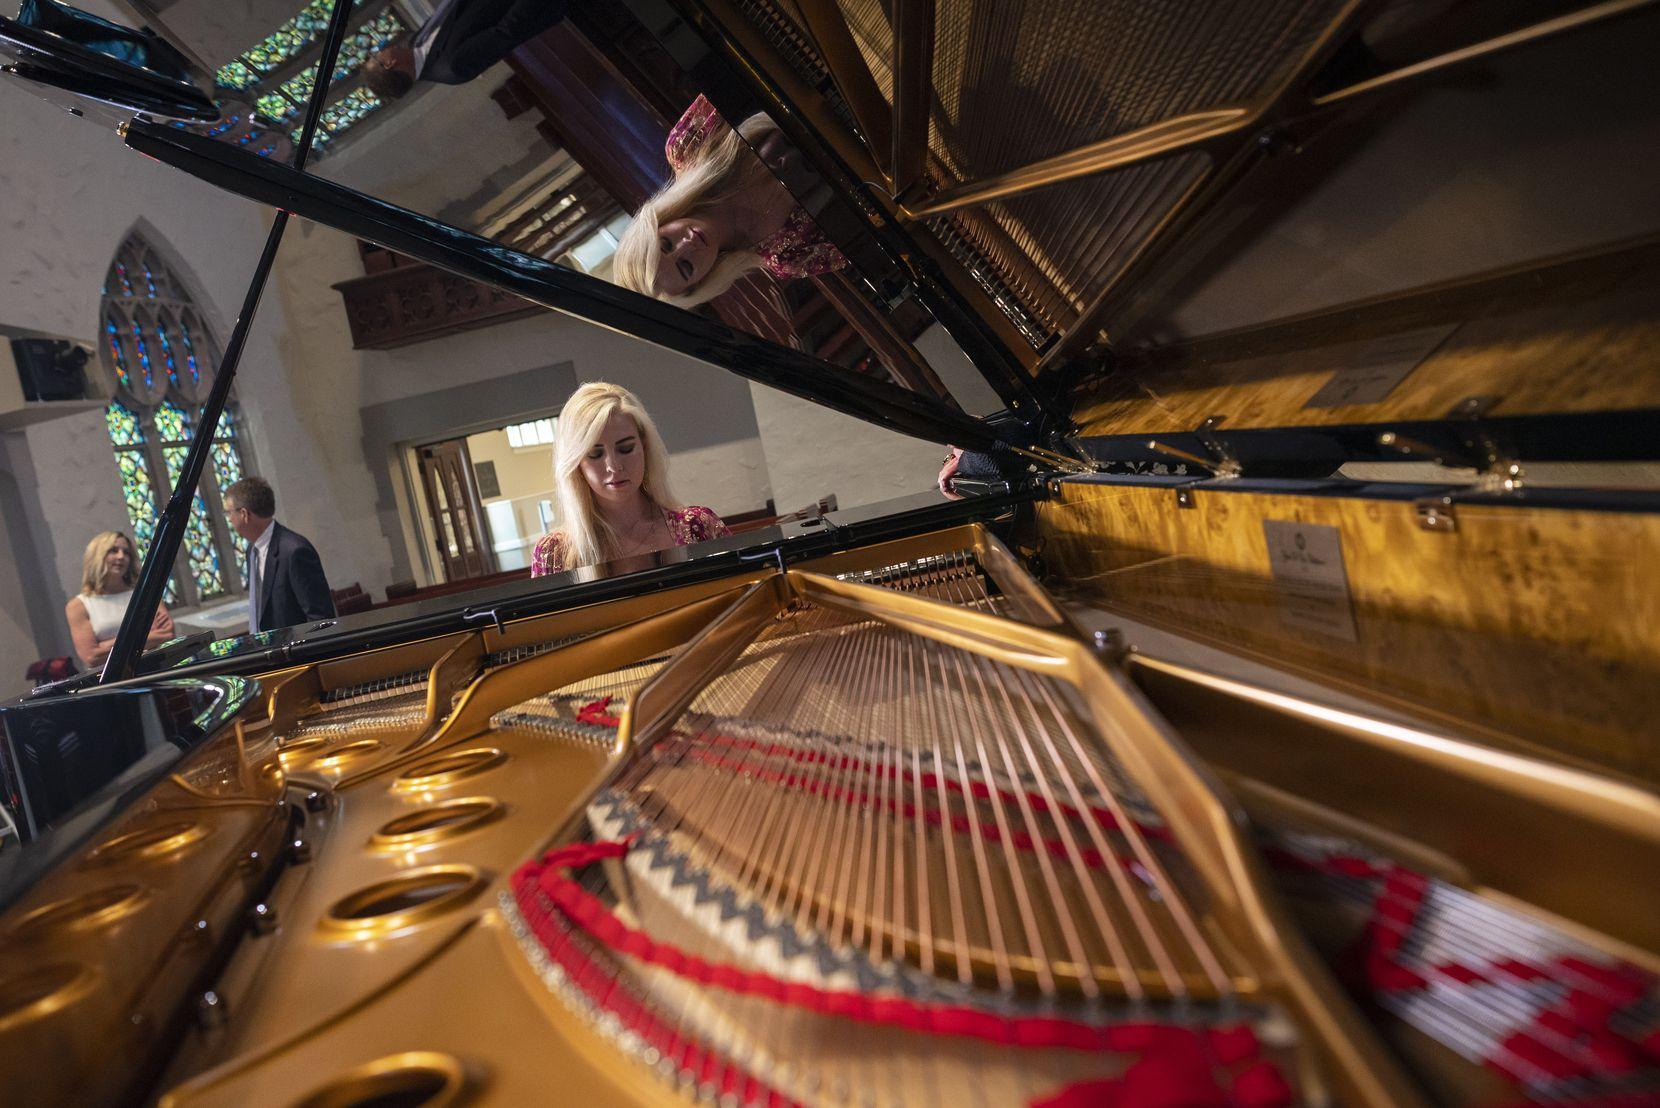 Pianist Natasha Paremski plays the Fazioli grand piano at Highland Park United Methodist Church.